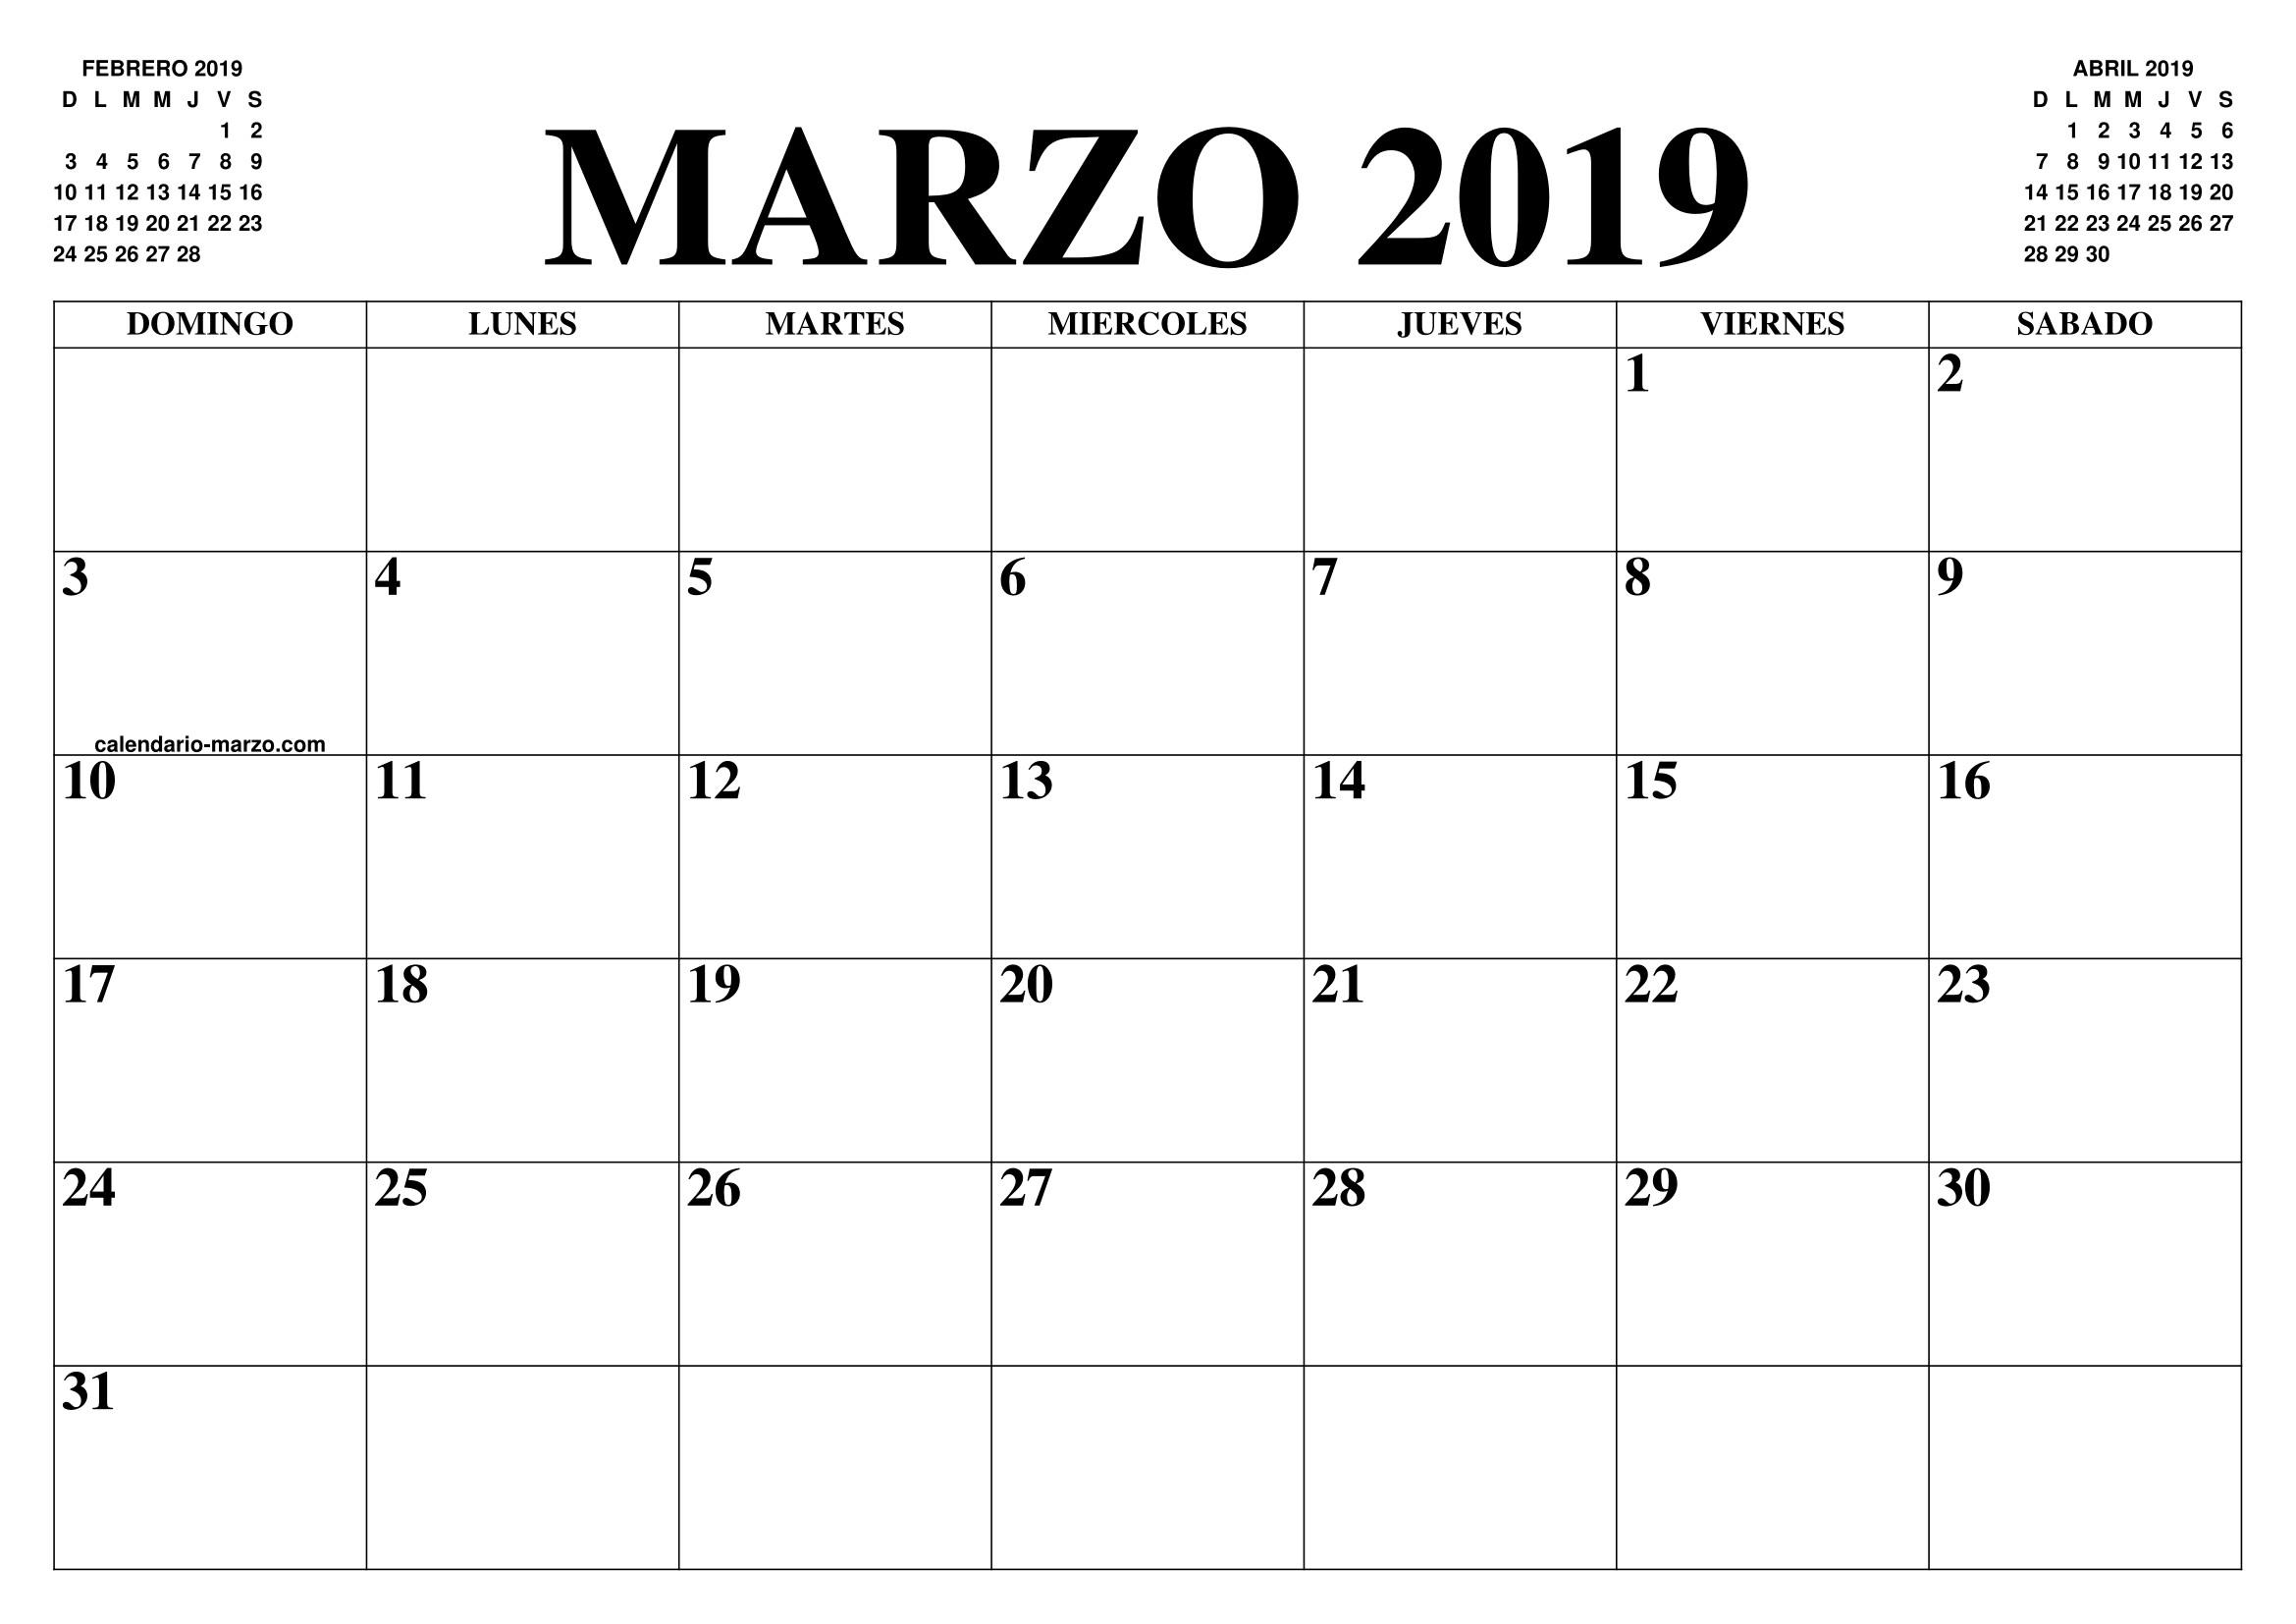 Imprimir Calendario Mes Octubre 2019 Actual Abril 2019 15 21 22 30 orchid